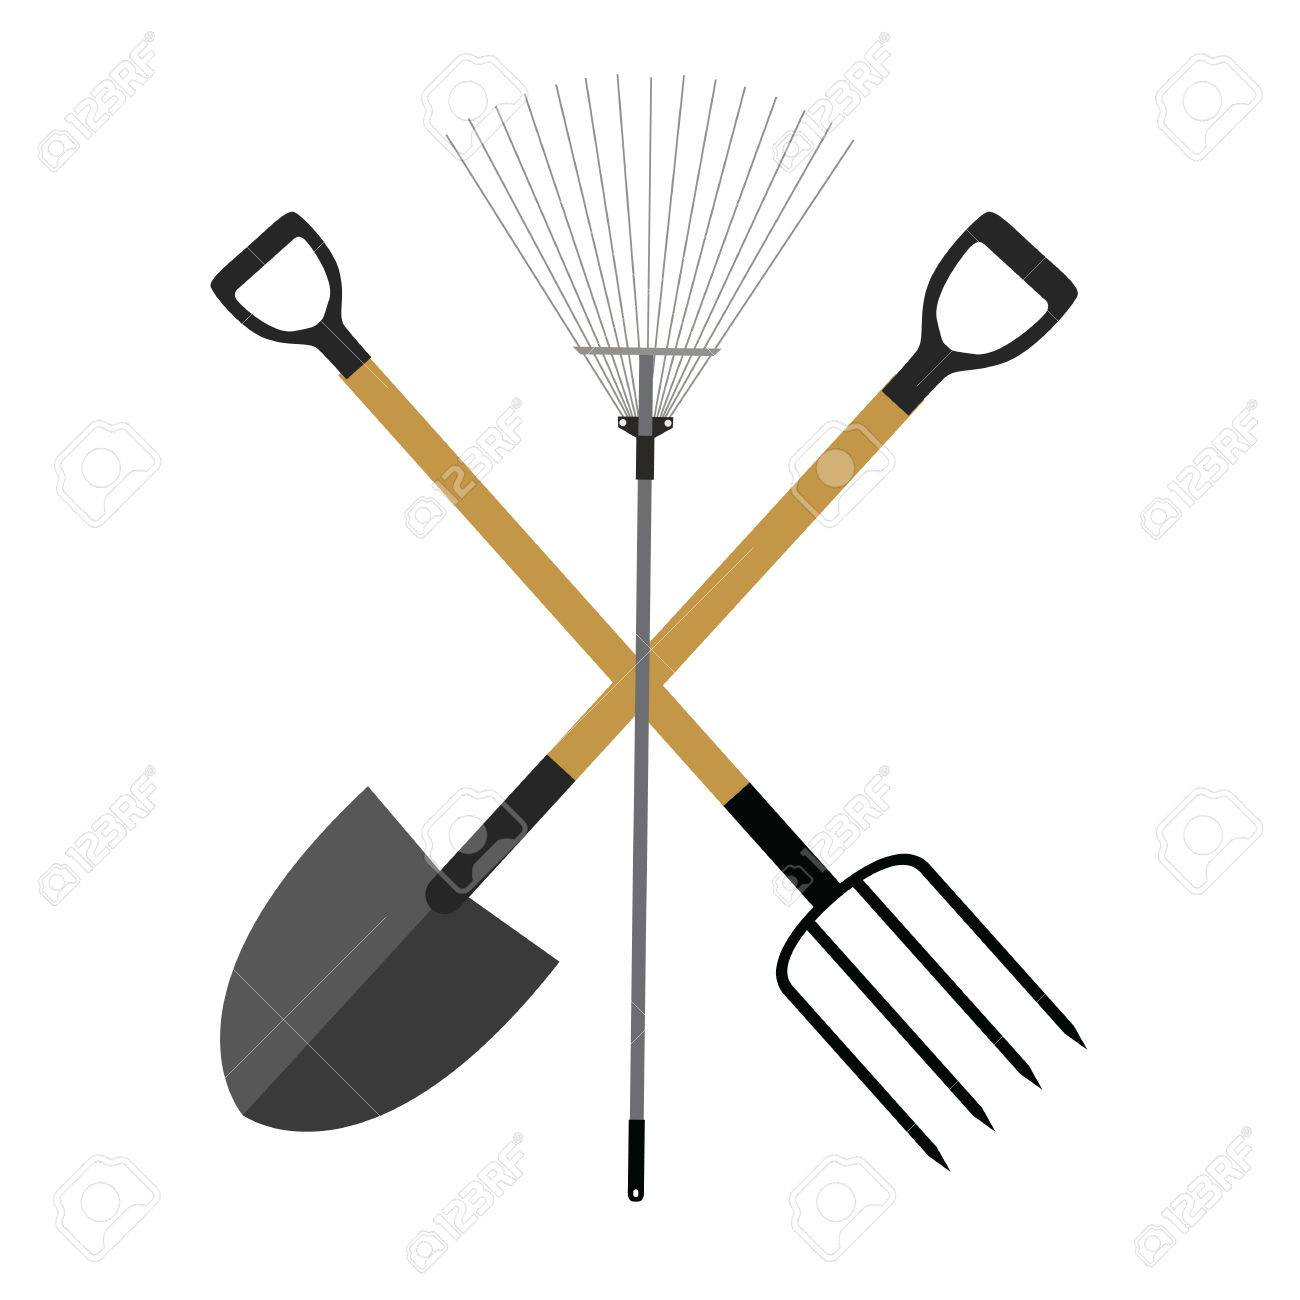 Garden Tools, Instruments Flat Icon Collection Set. Shovel, Rake And  Pitchfork Vector Illustration